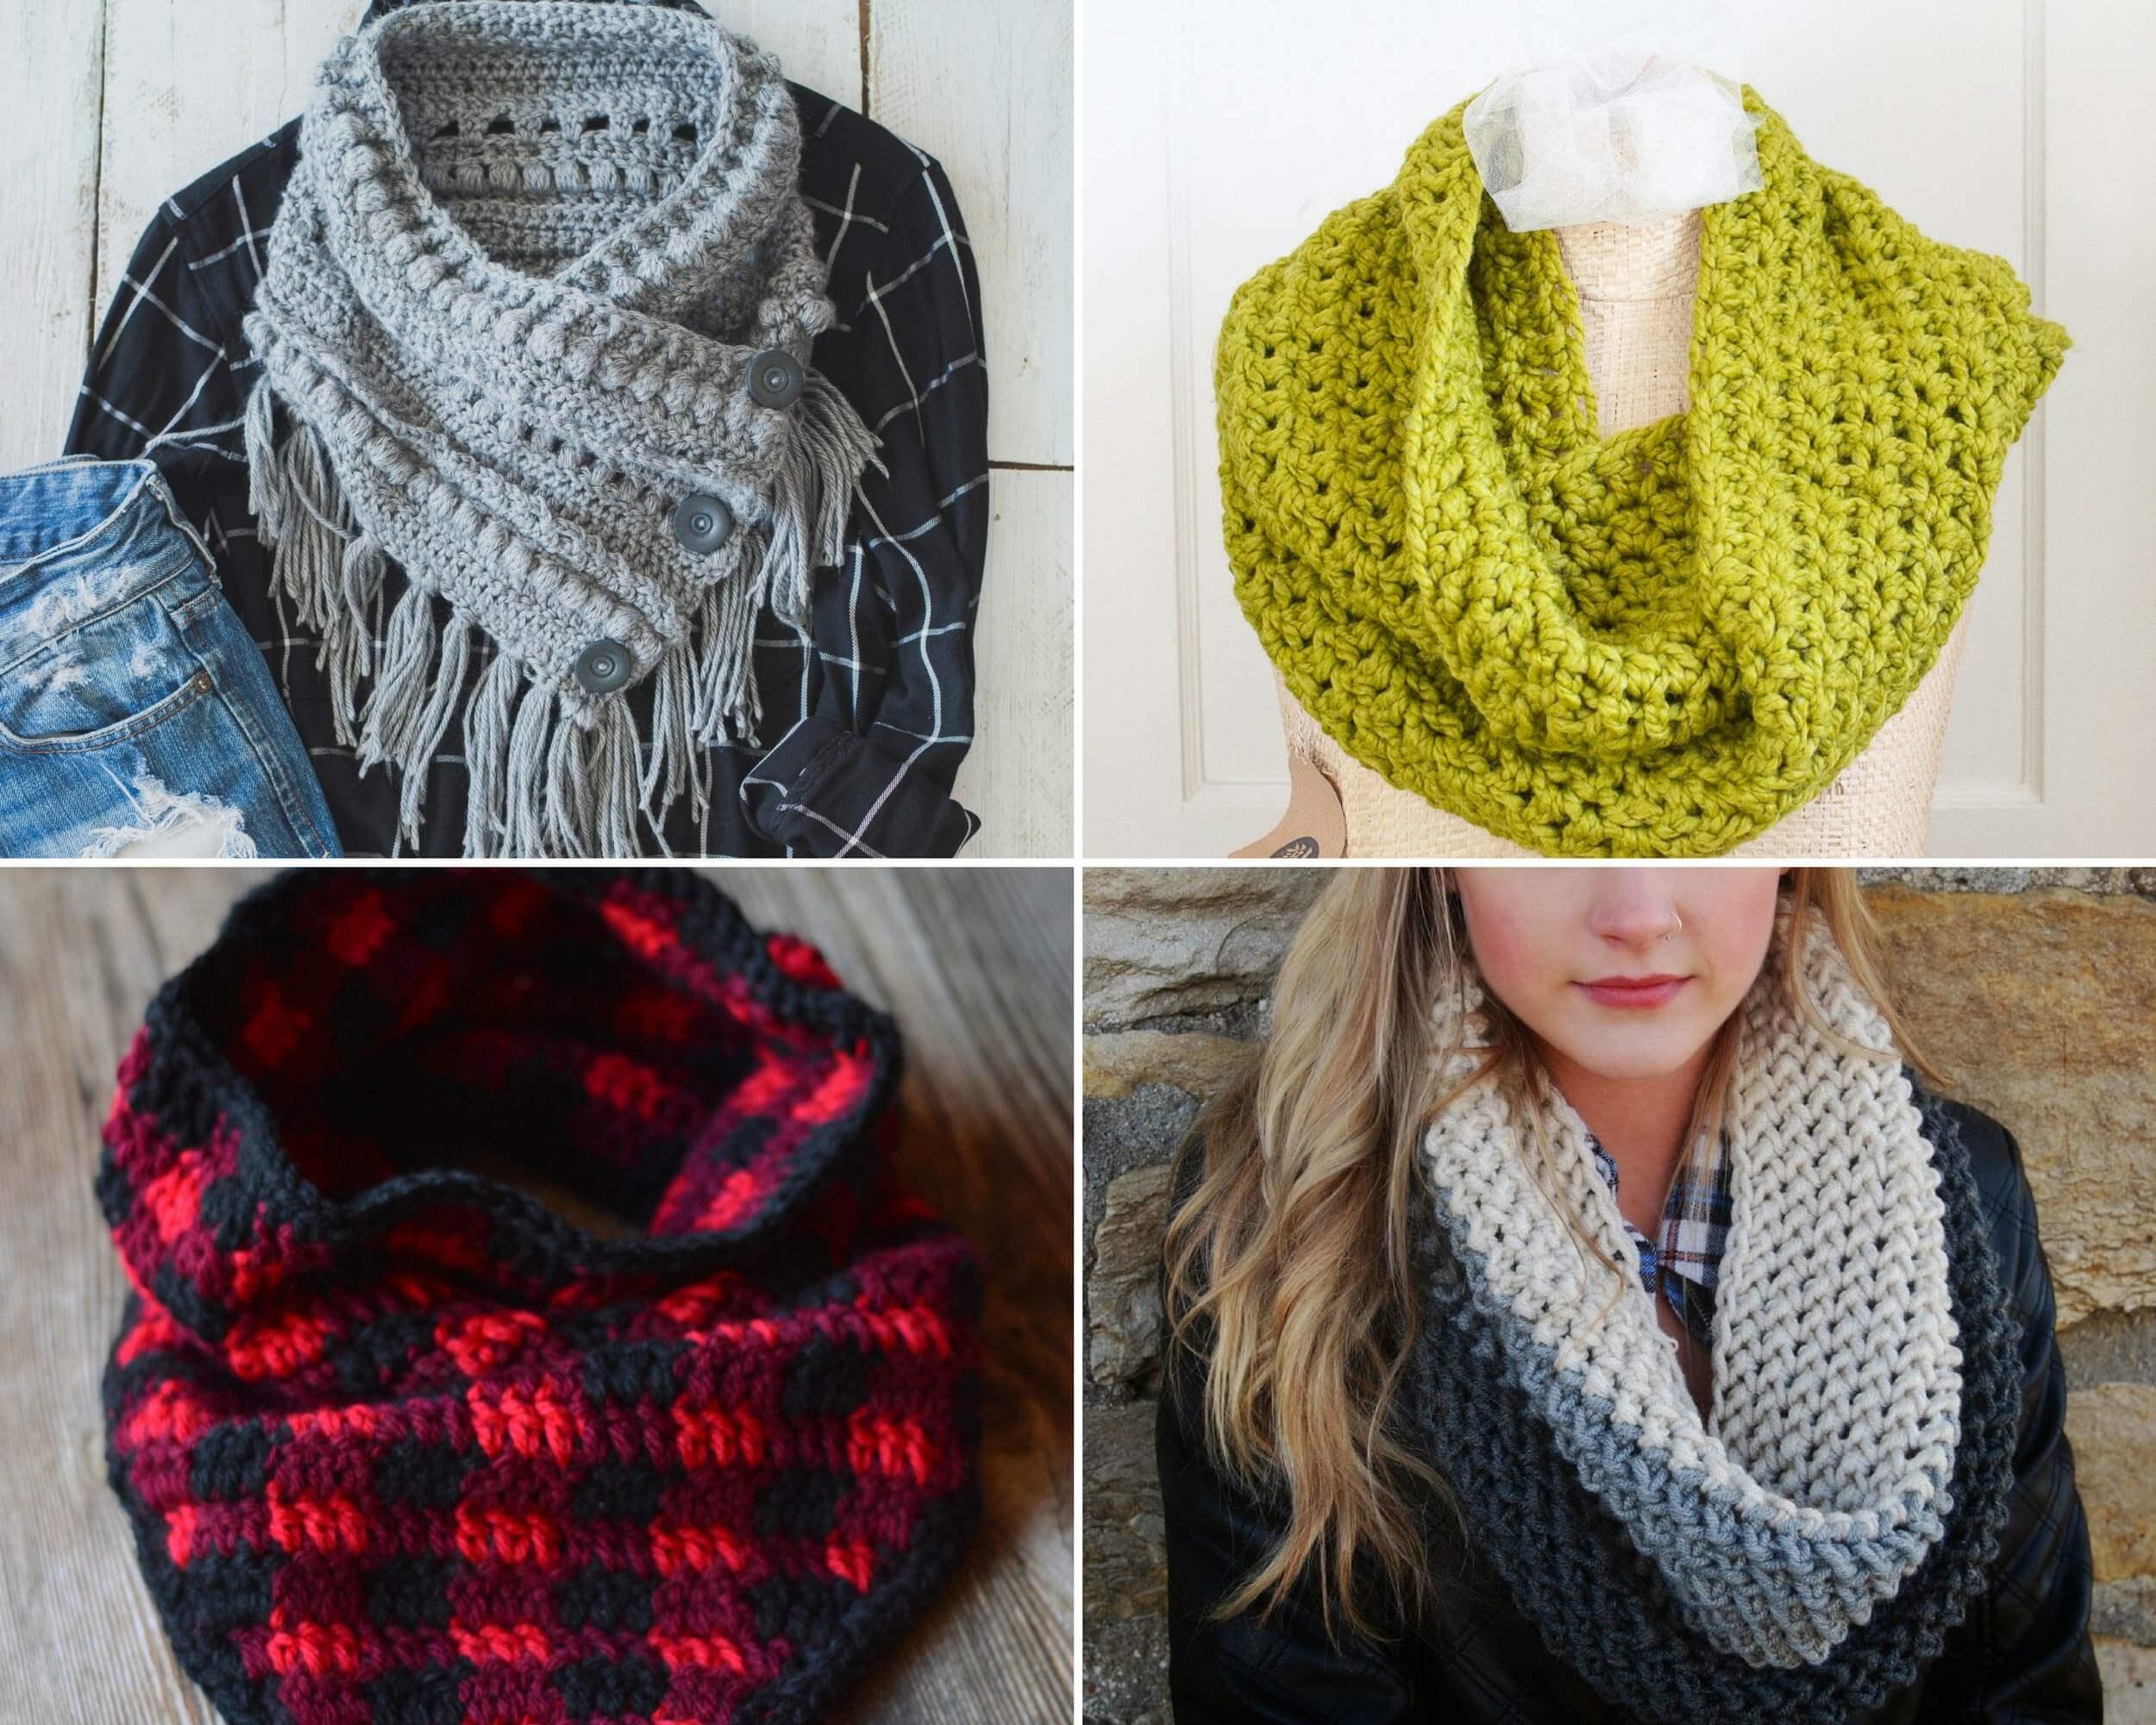 crochet cowl pattern 15 free cowl crochet patterns. these make wonderful gifts and fashion  statements. qluuxrj